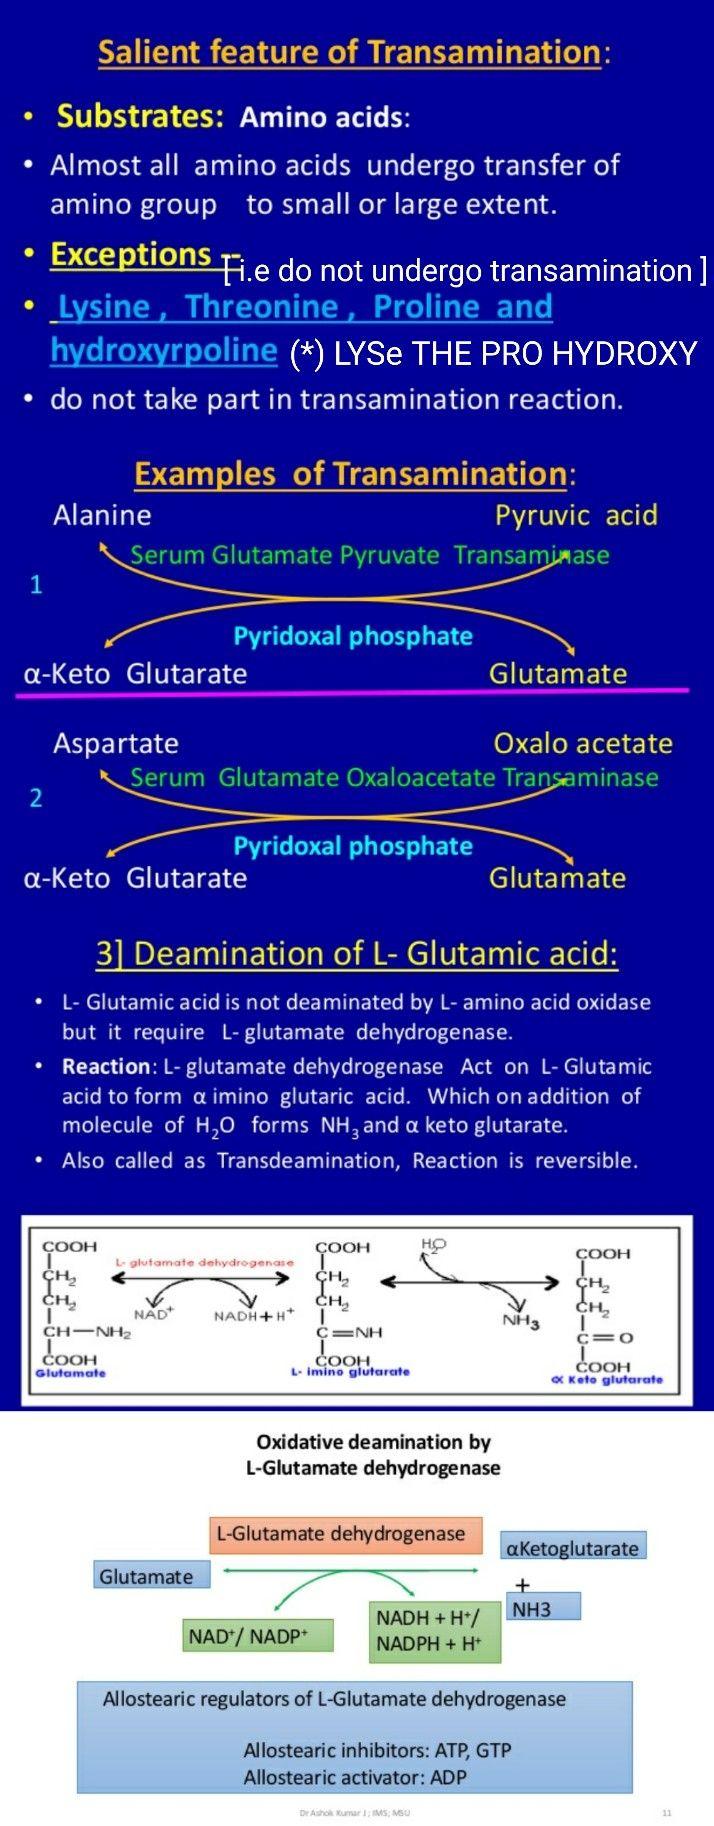 Transamination & Deamination of Glutamic acid ... v.imp ... #Alpha Ketoglutarate